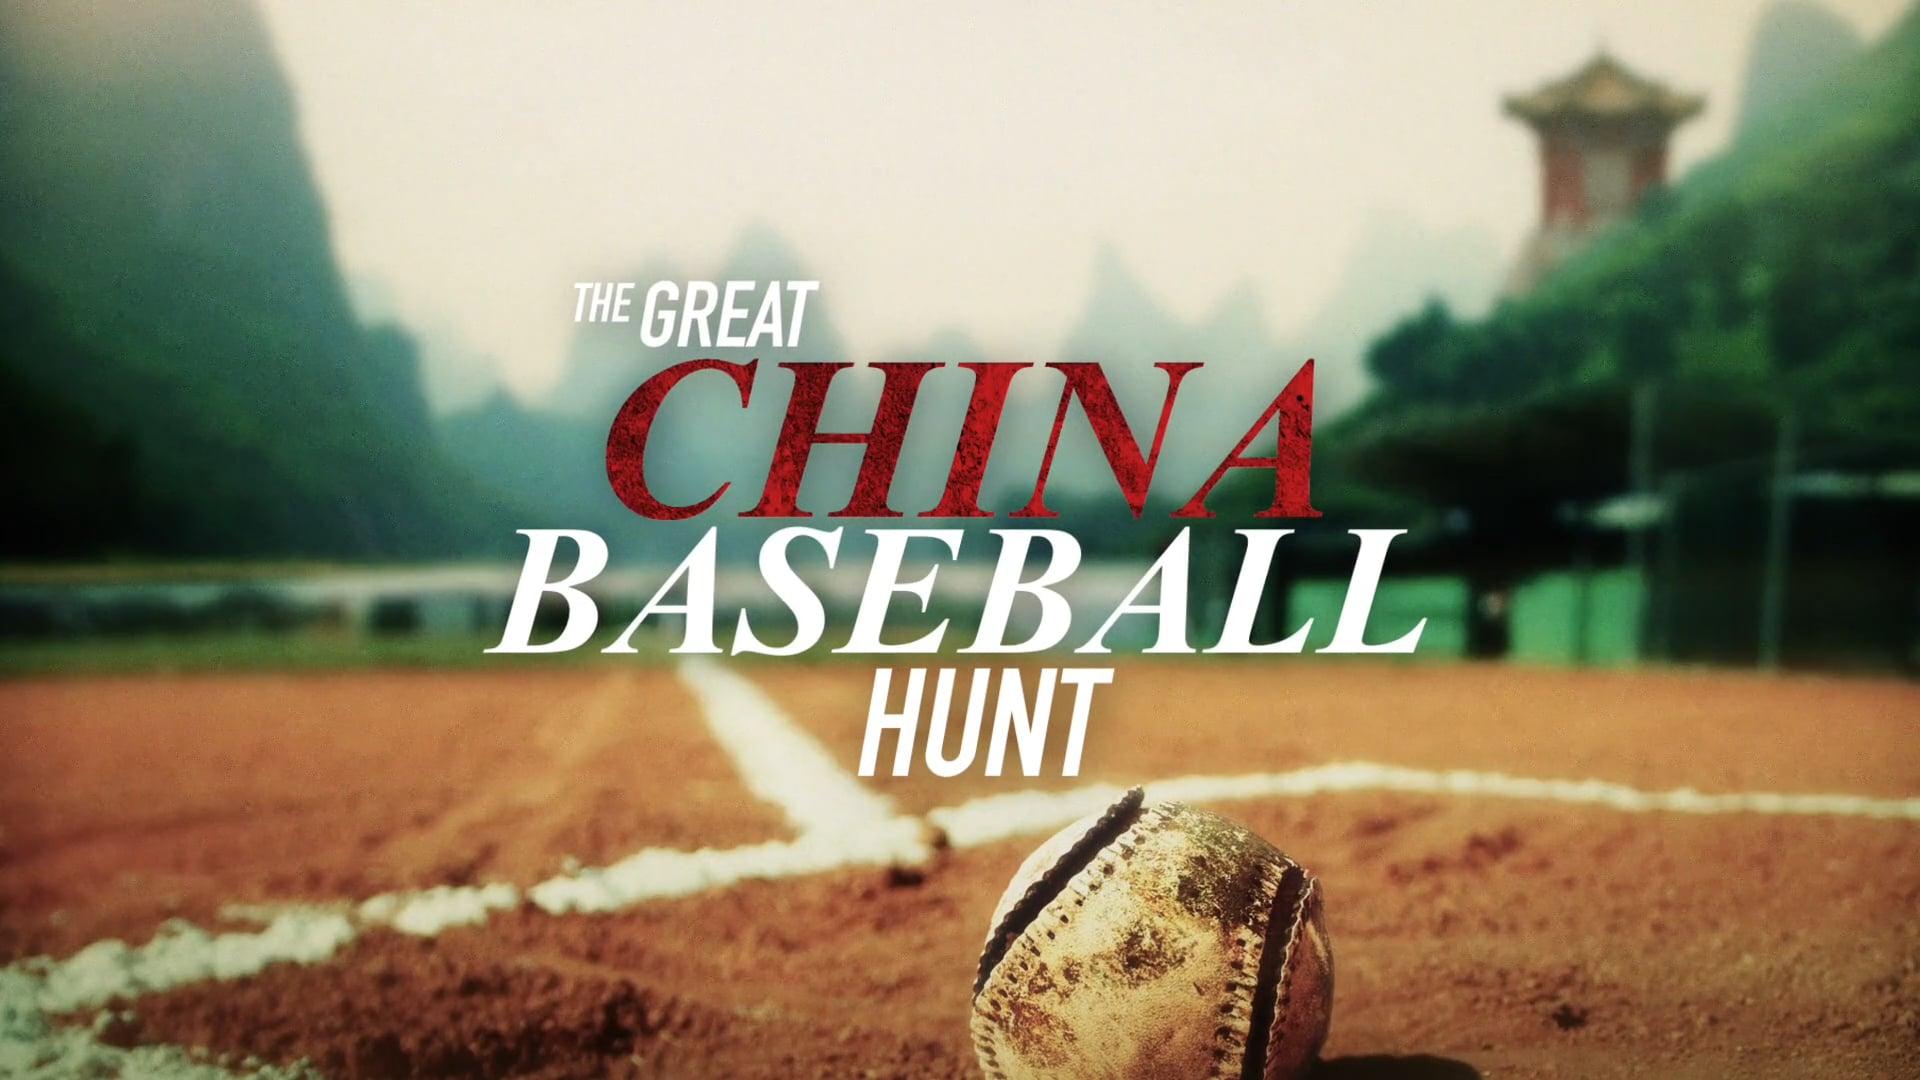 The Great China Baseball Hunt - Trailer